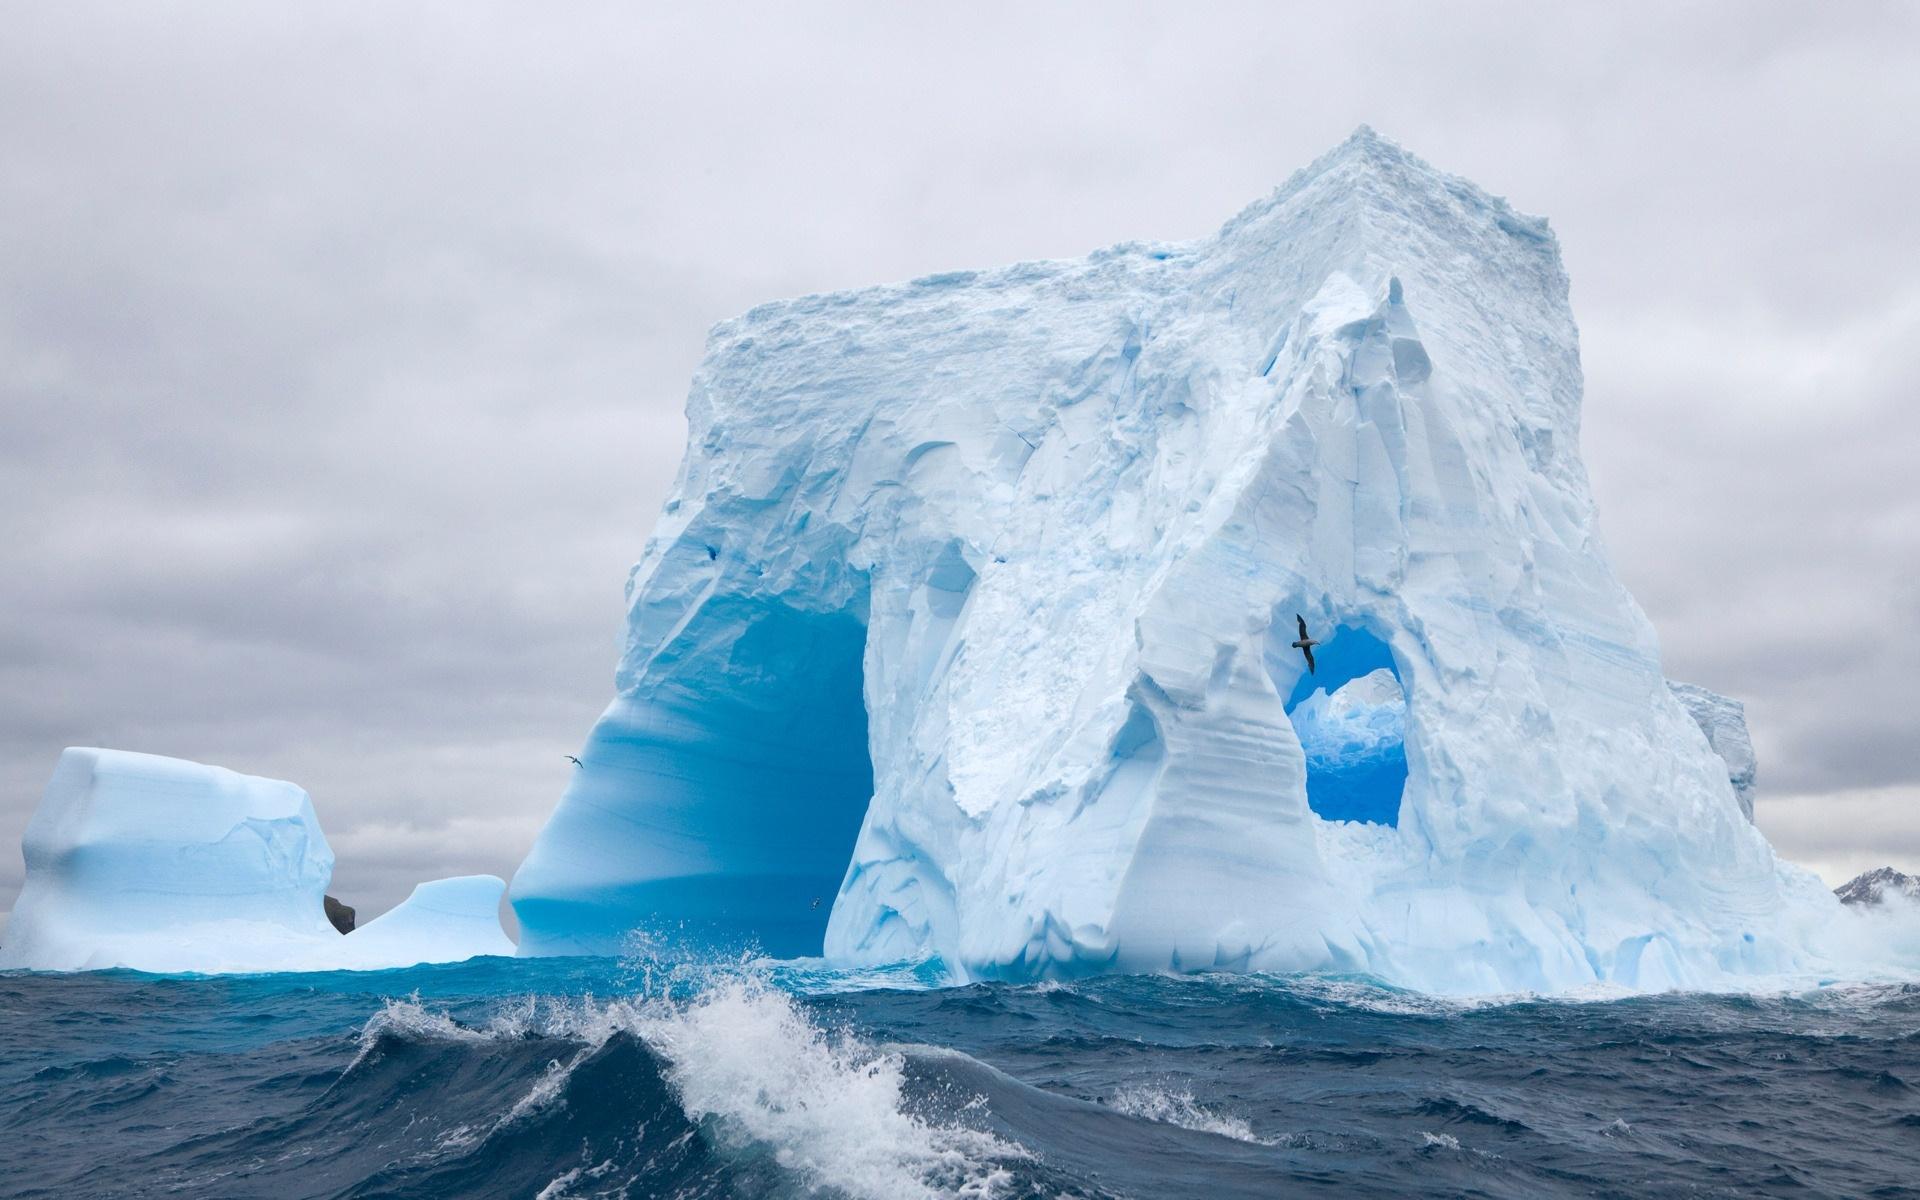 ice_berg_fly_thru-1920x1200.jpg